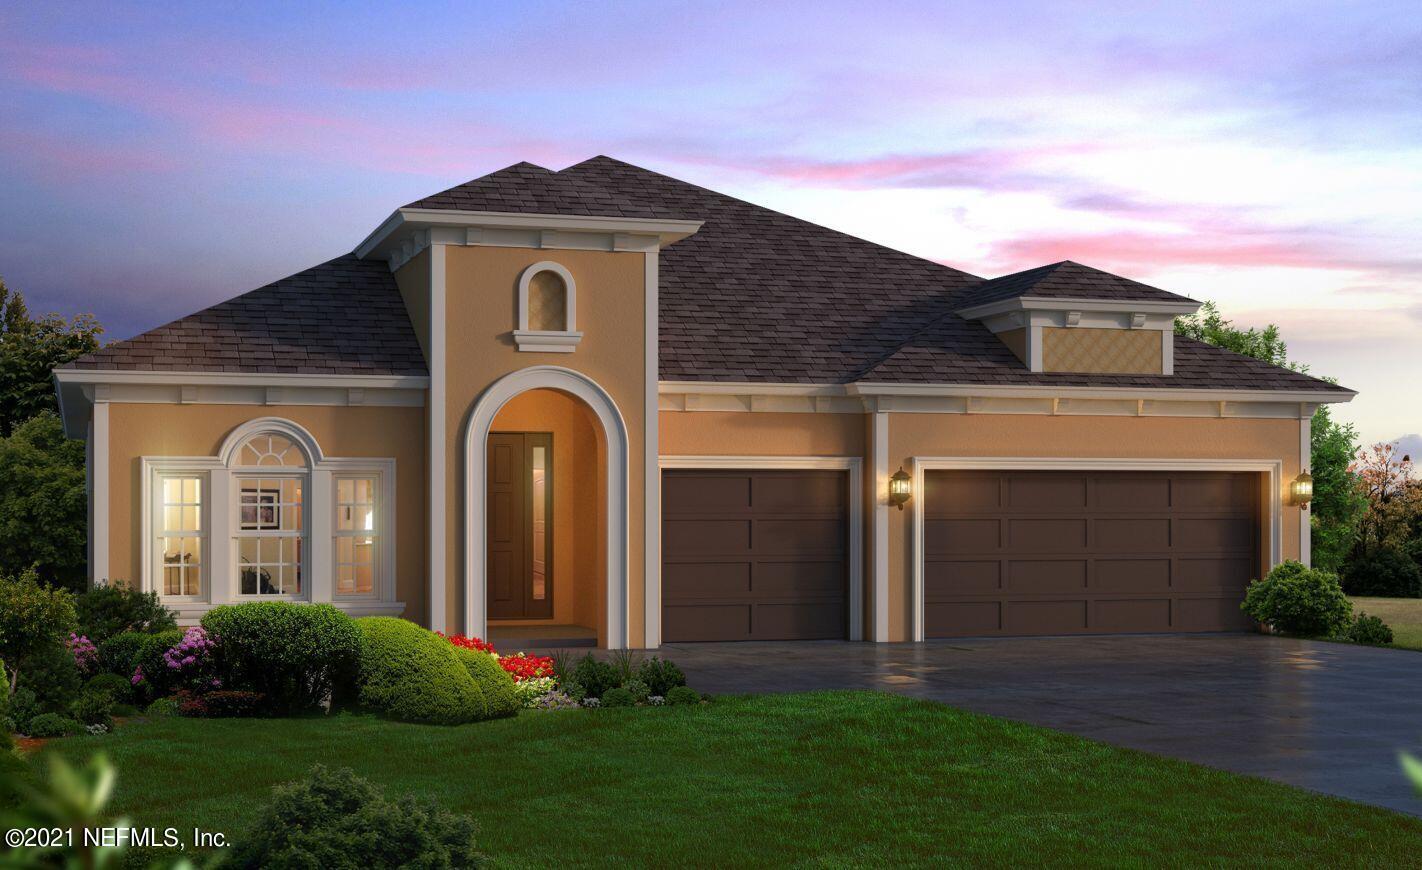 Listing Details for 2599 Cassia Ln, JACKSONVILLE, FL 32246